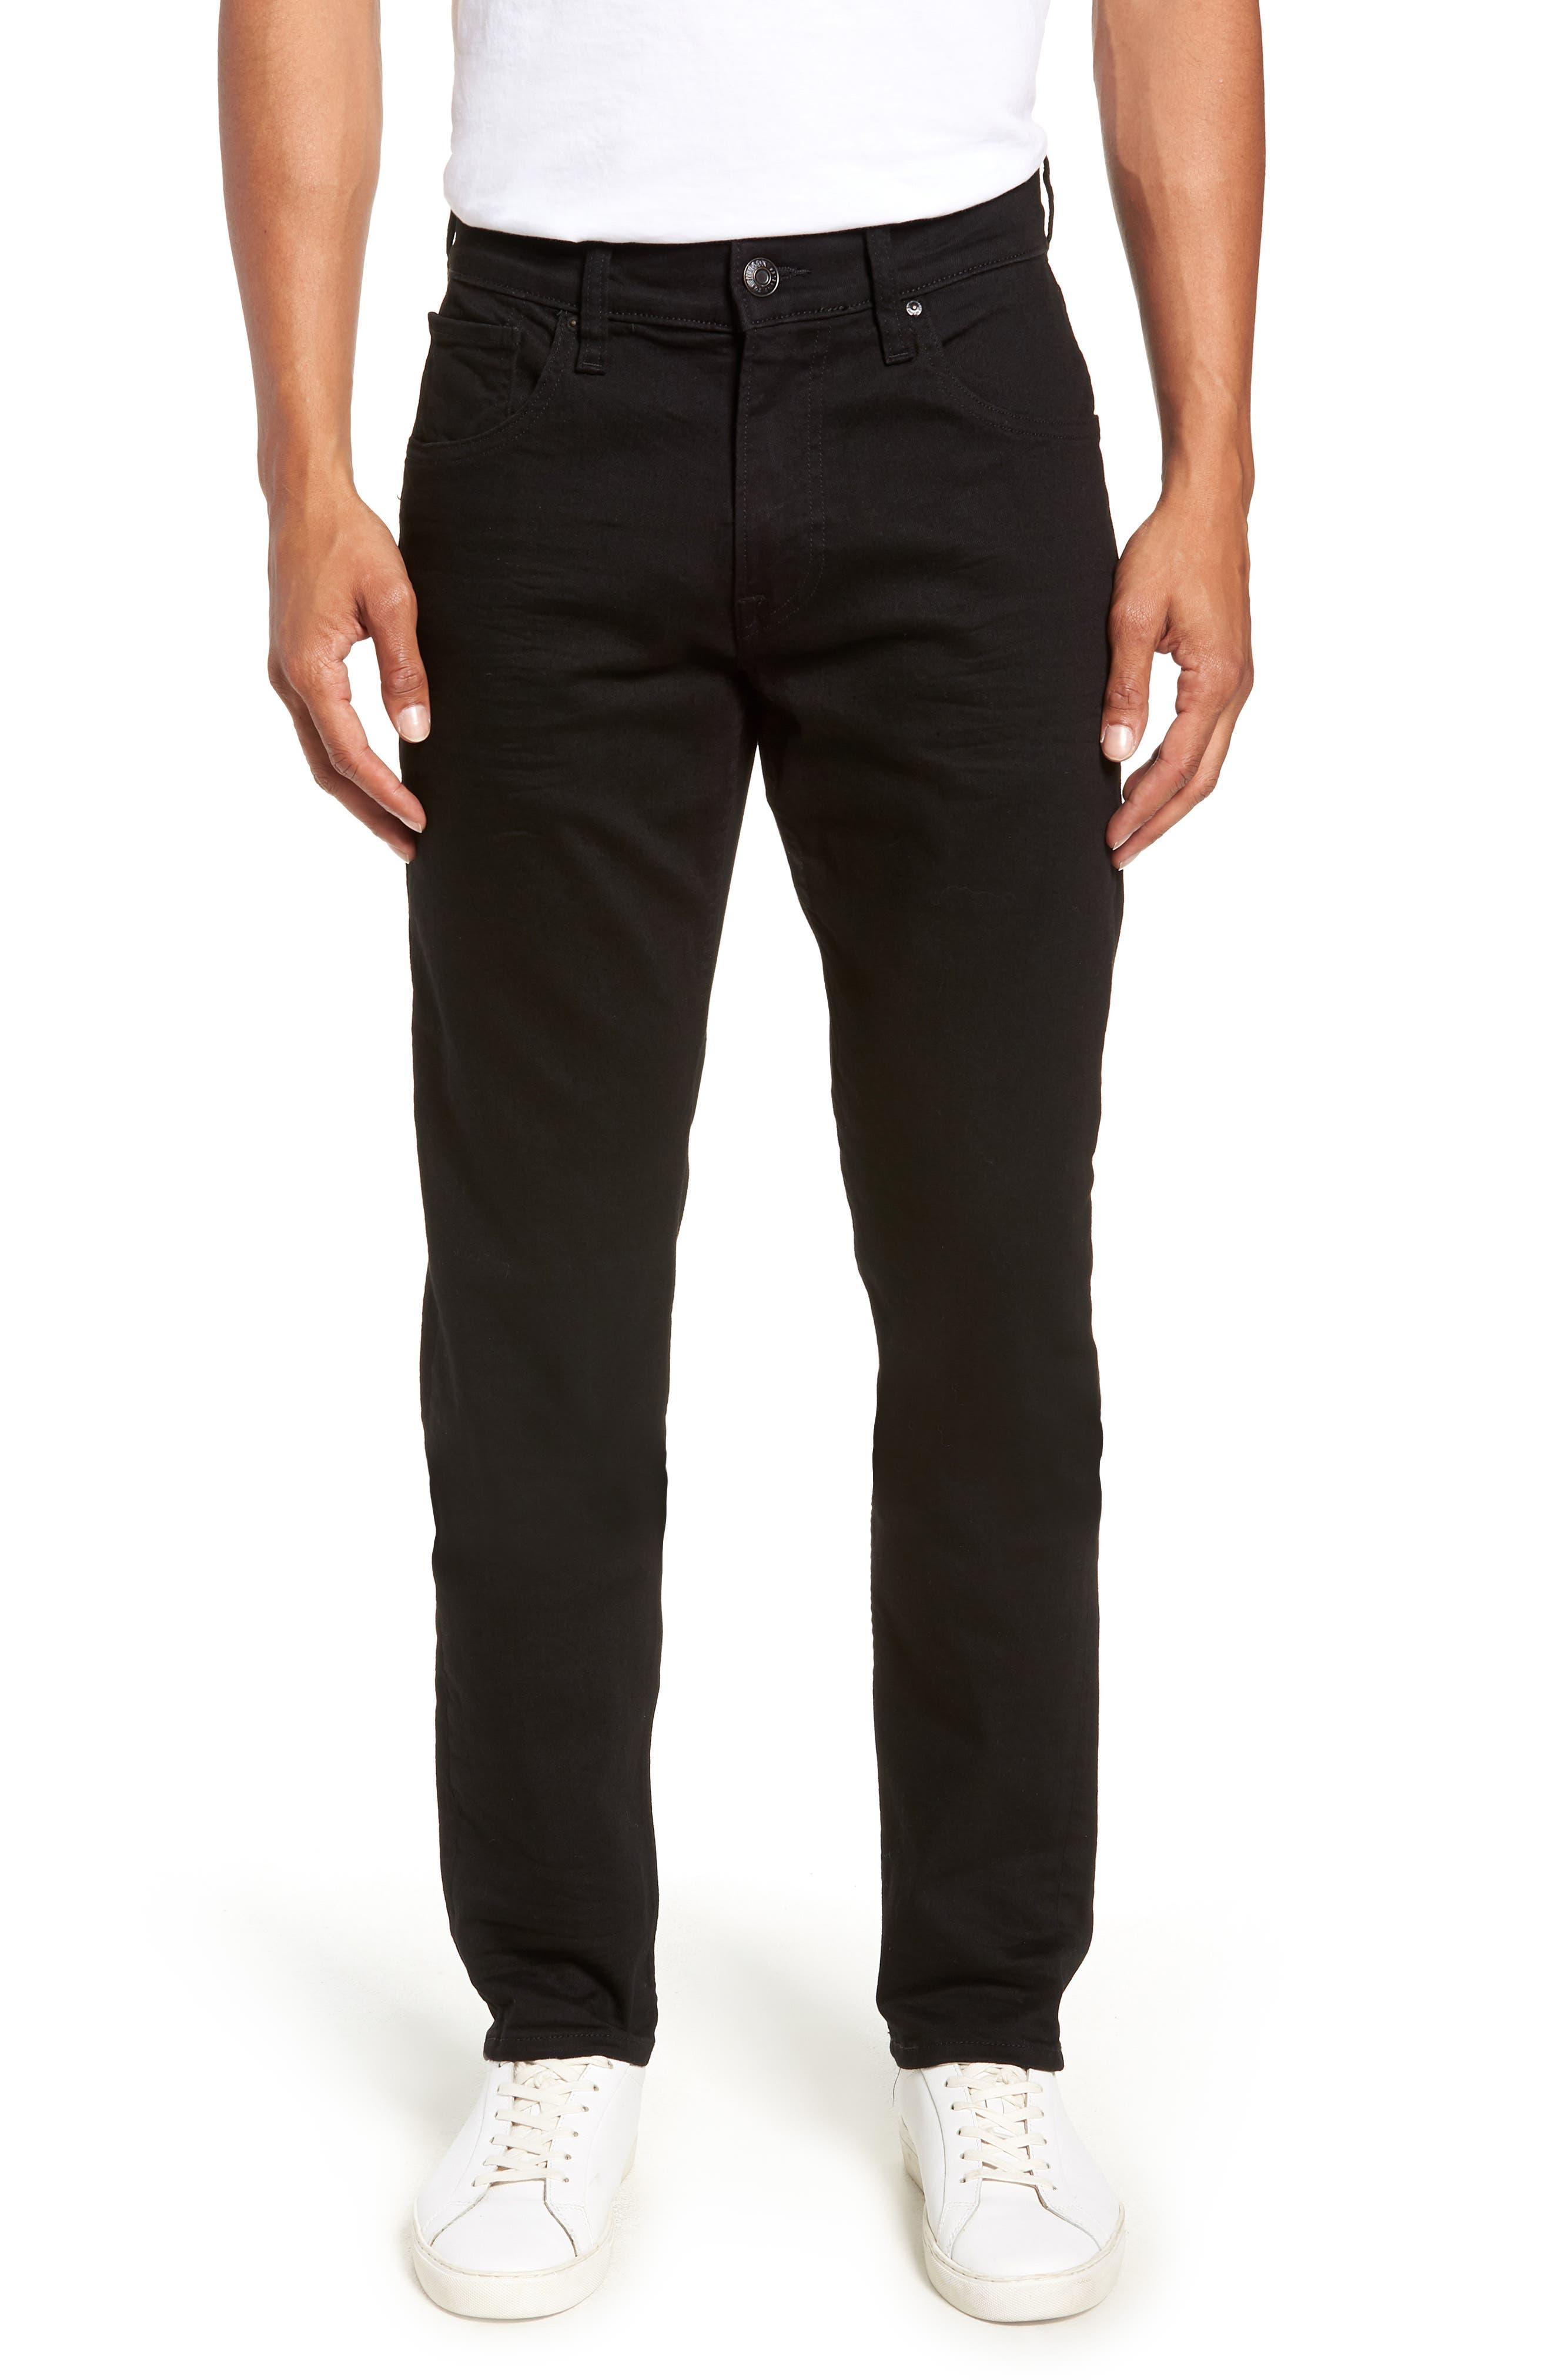 HUDSON JEANS Blake Slim Fit Straight Leg Jeans, Main, color, HASKETT